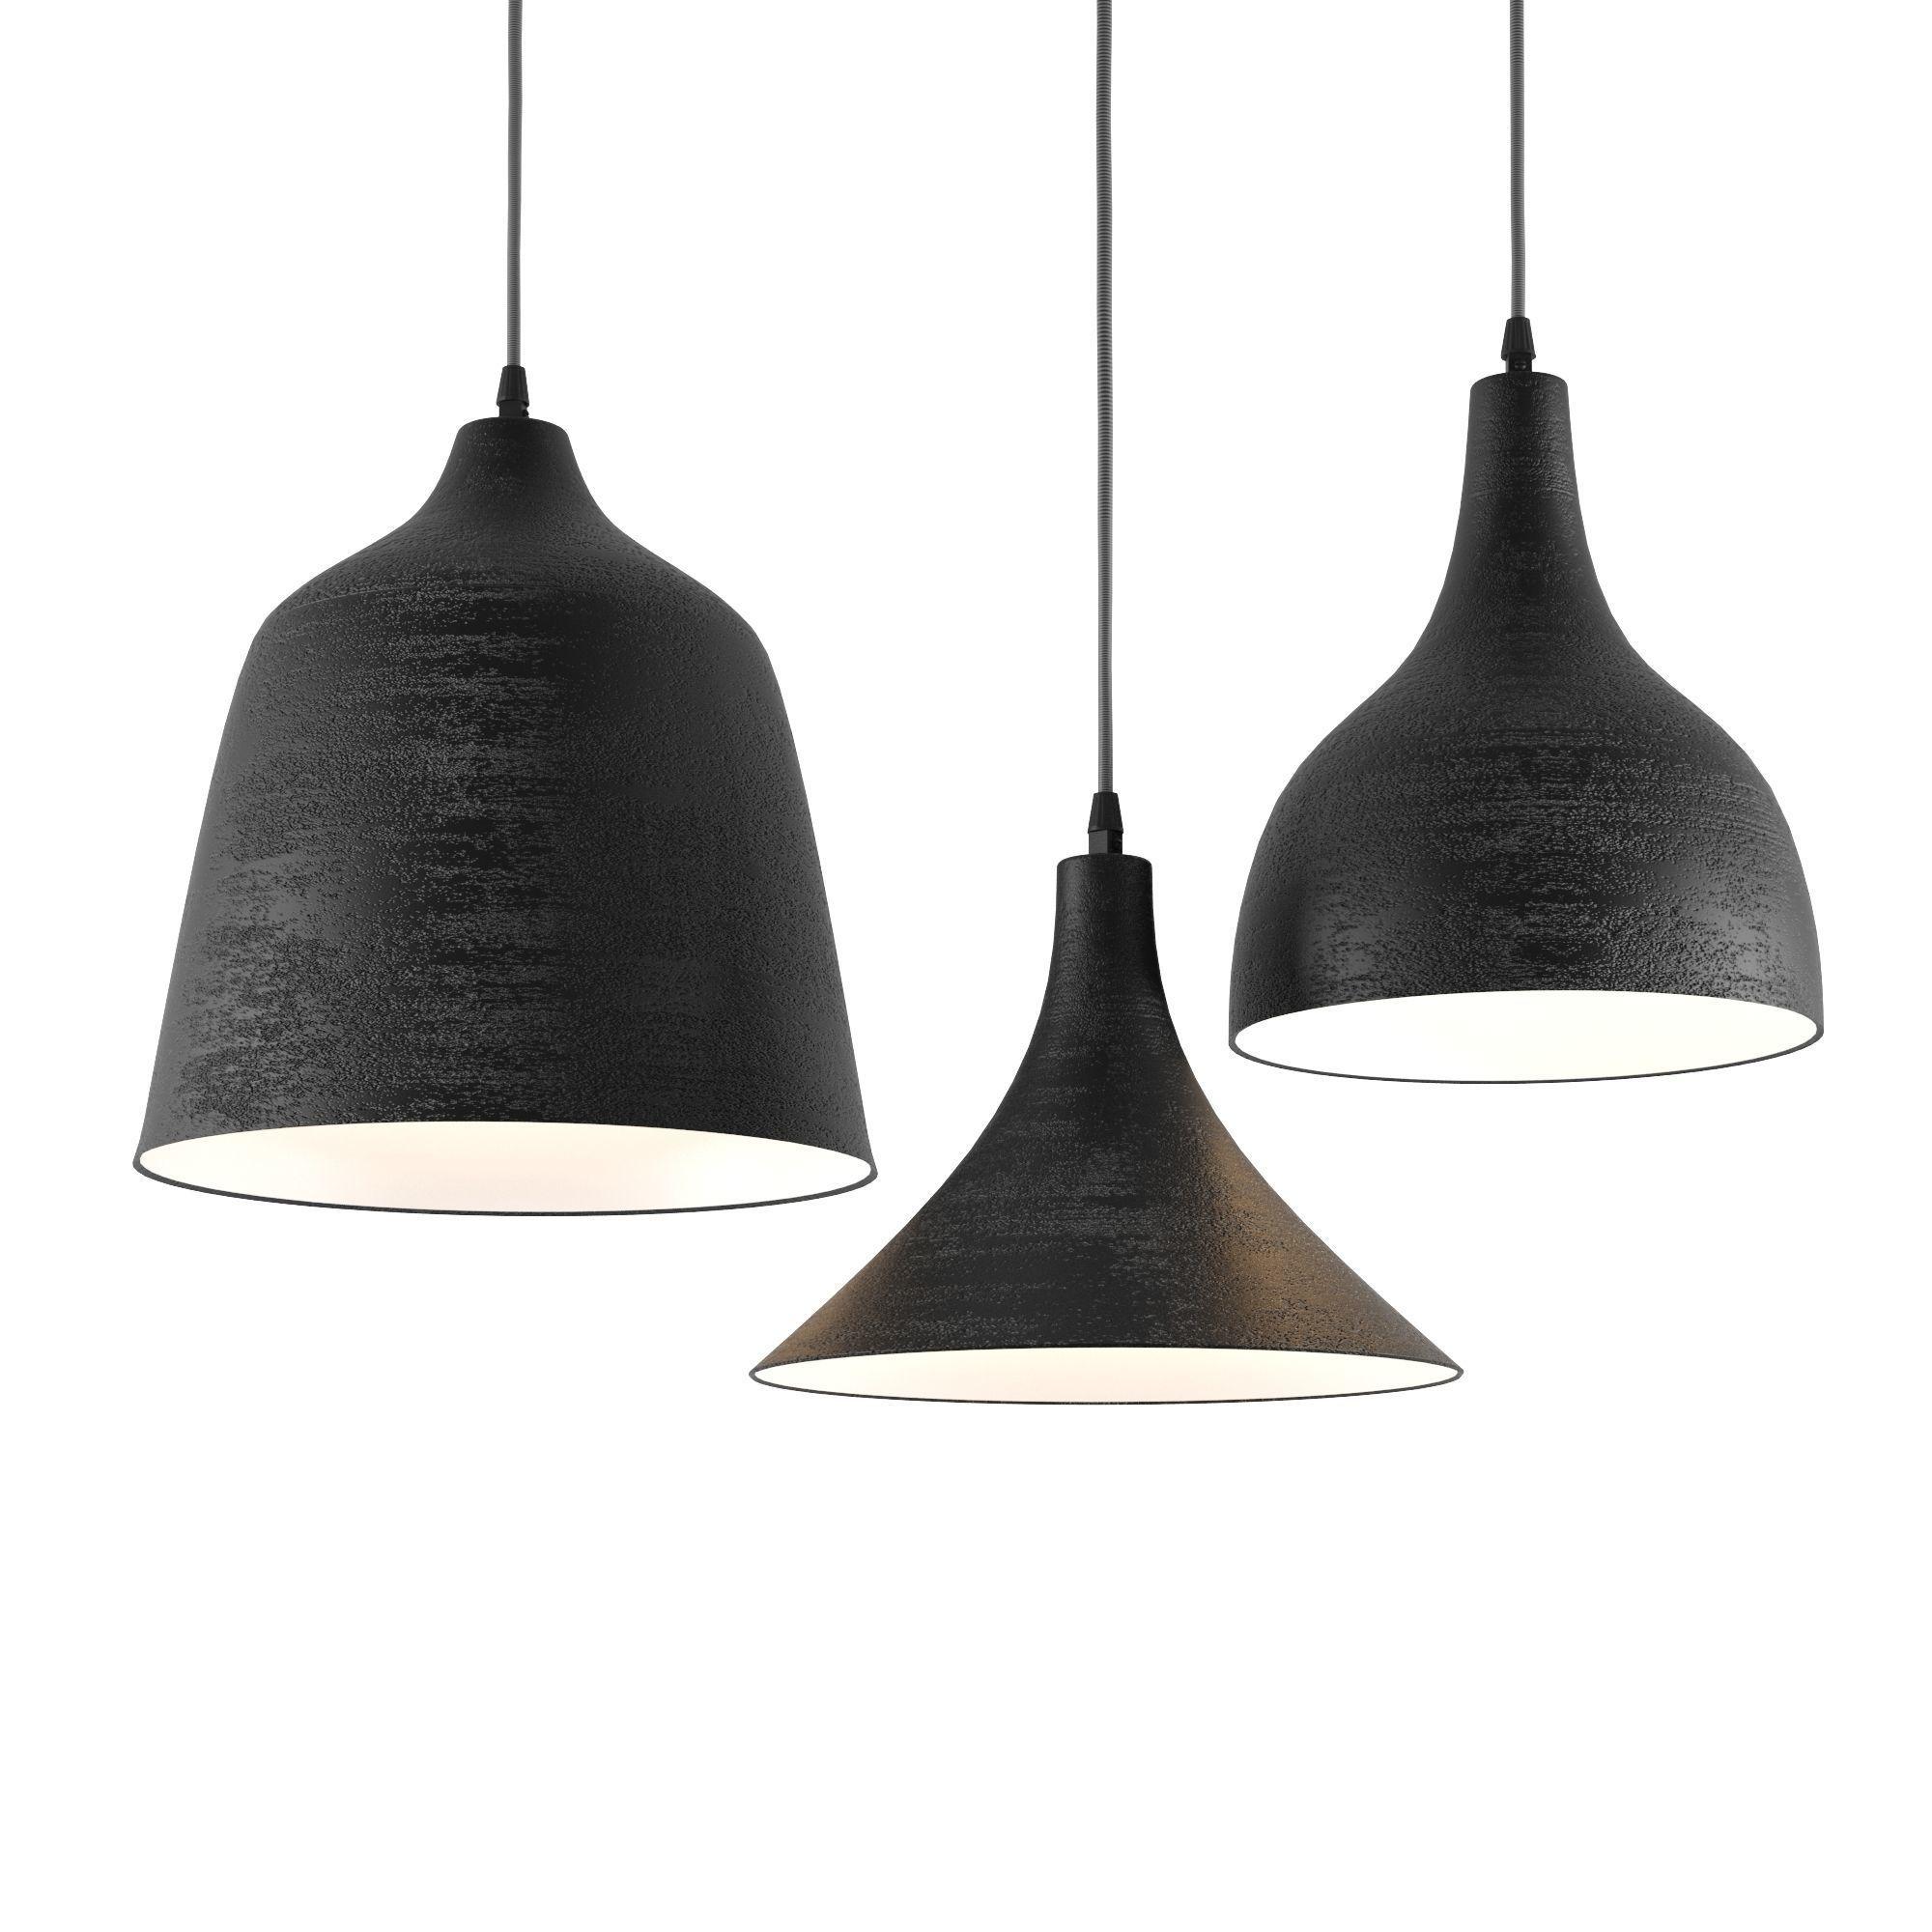 T-Black lamps KARMAN